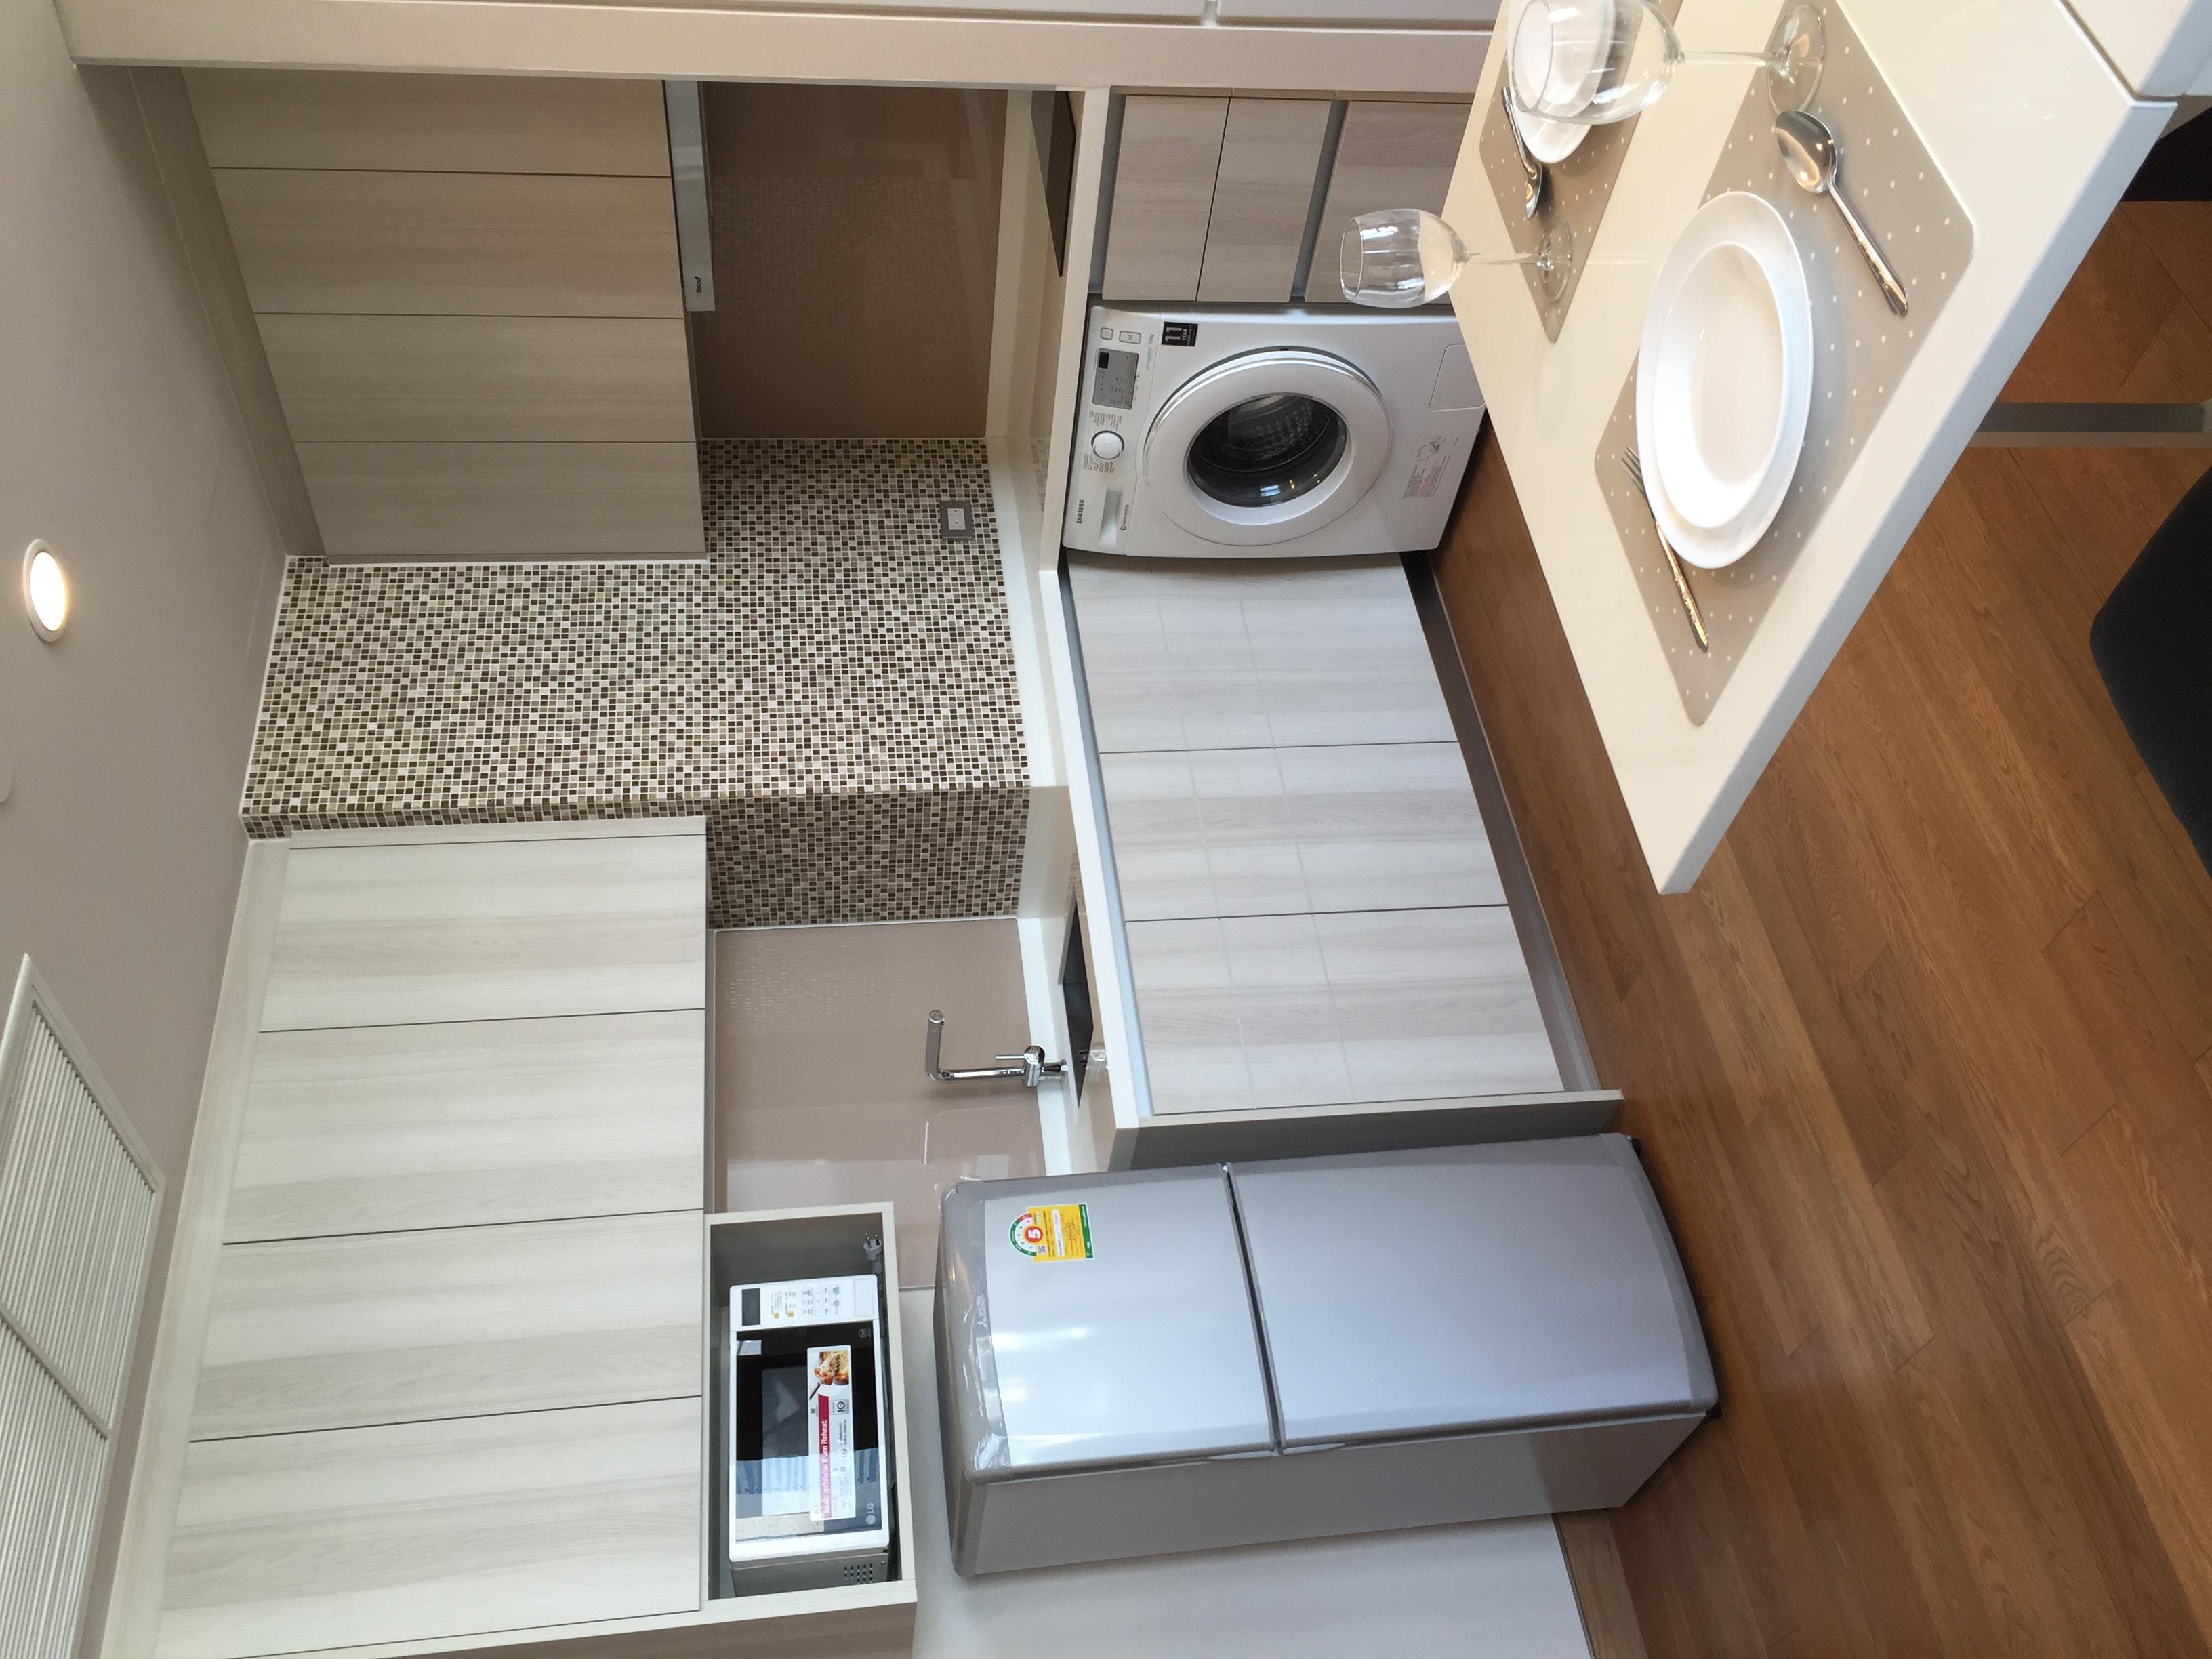 A10201035 Condo For Rent at The Lumpini 24